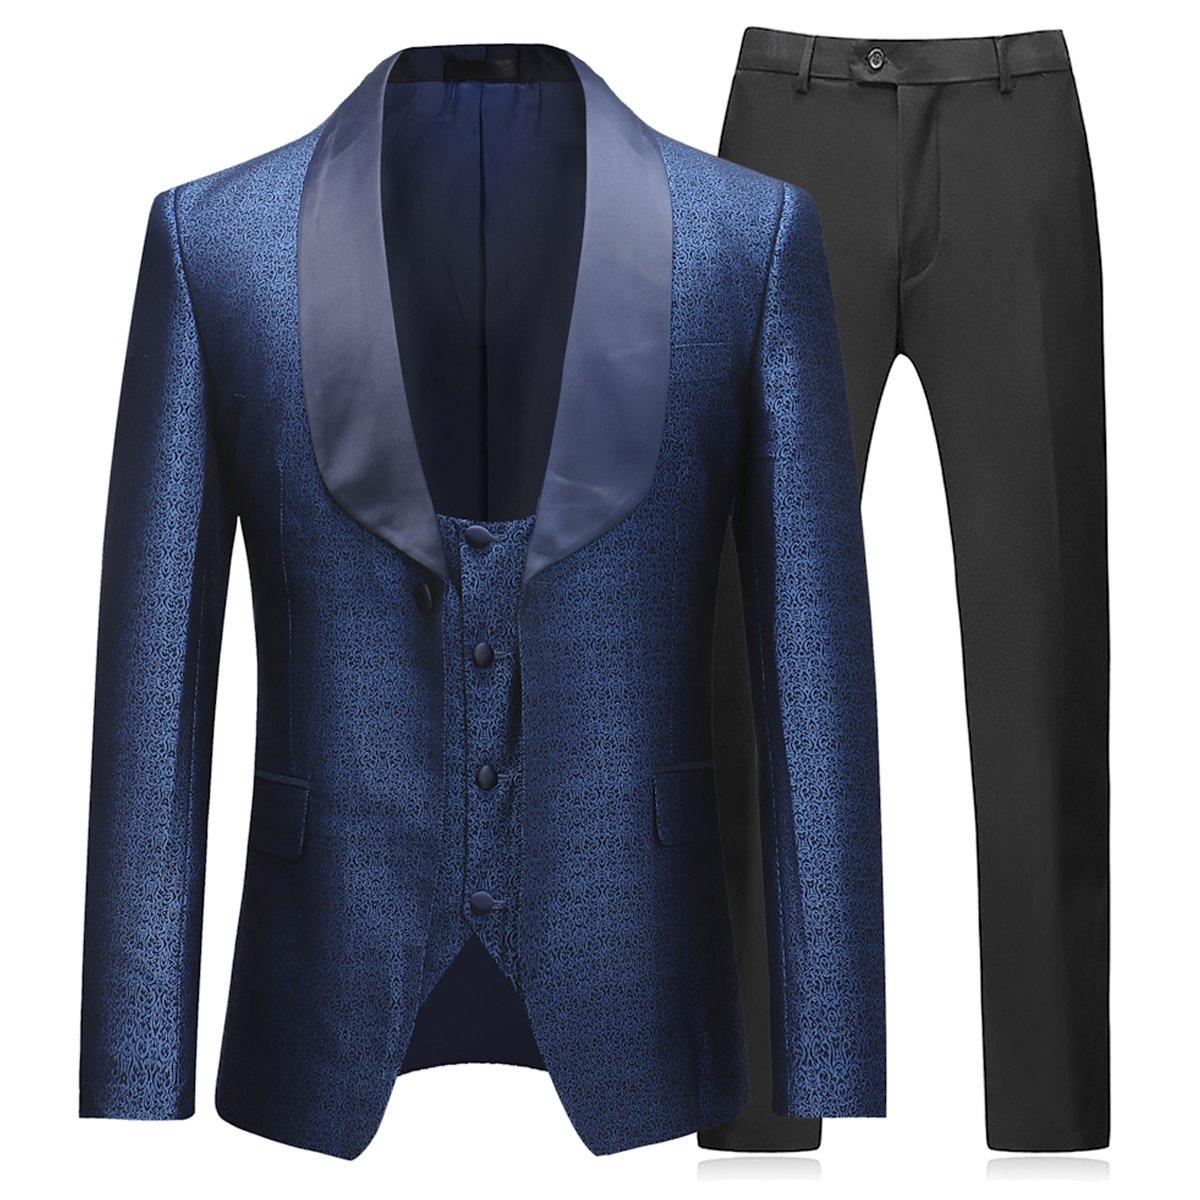 Mens Suits 3 Piece Slim Fit Tuxedo Jacket Business Wedding Dinner Party Wear Prom Dresses Blazer Waistcoat Trousers